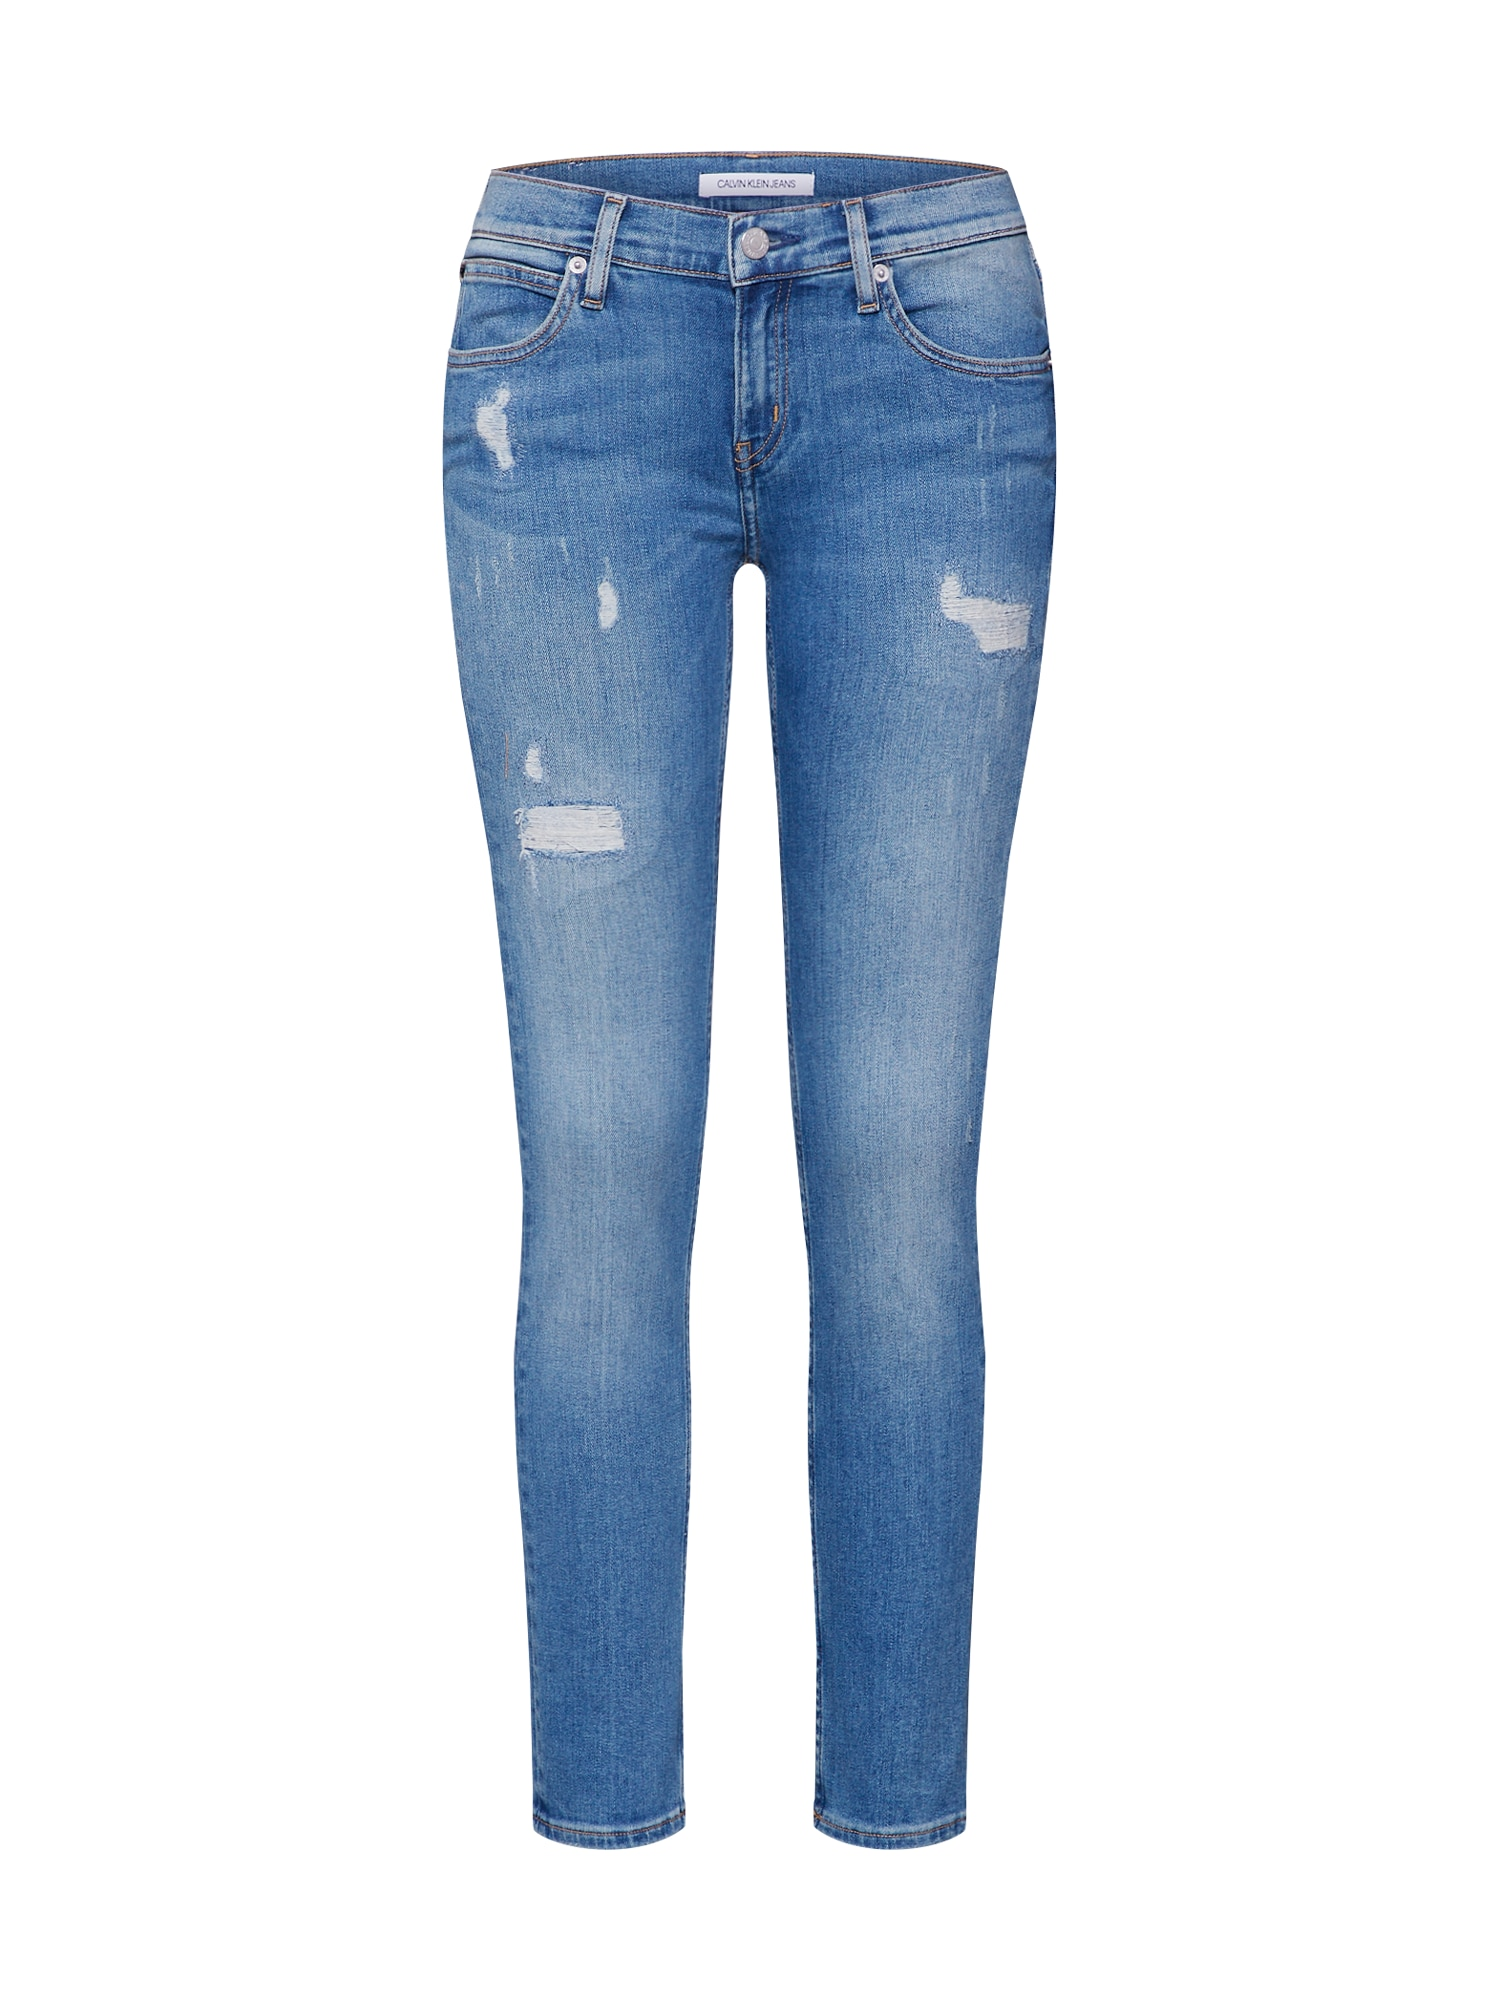 Džíny CKJ 022 BODY modrá džínovina Calvin Klein Jeans